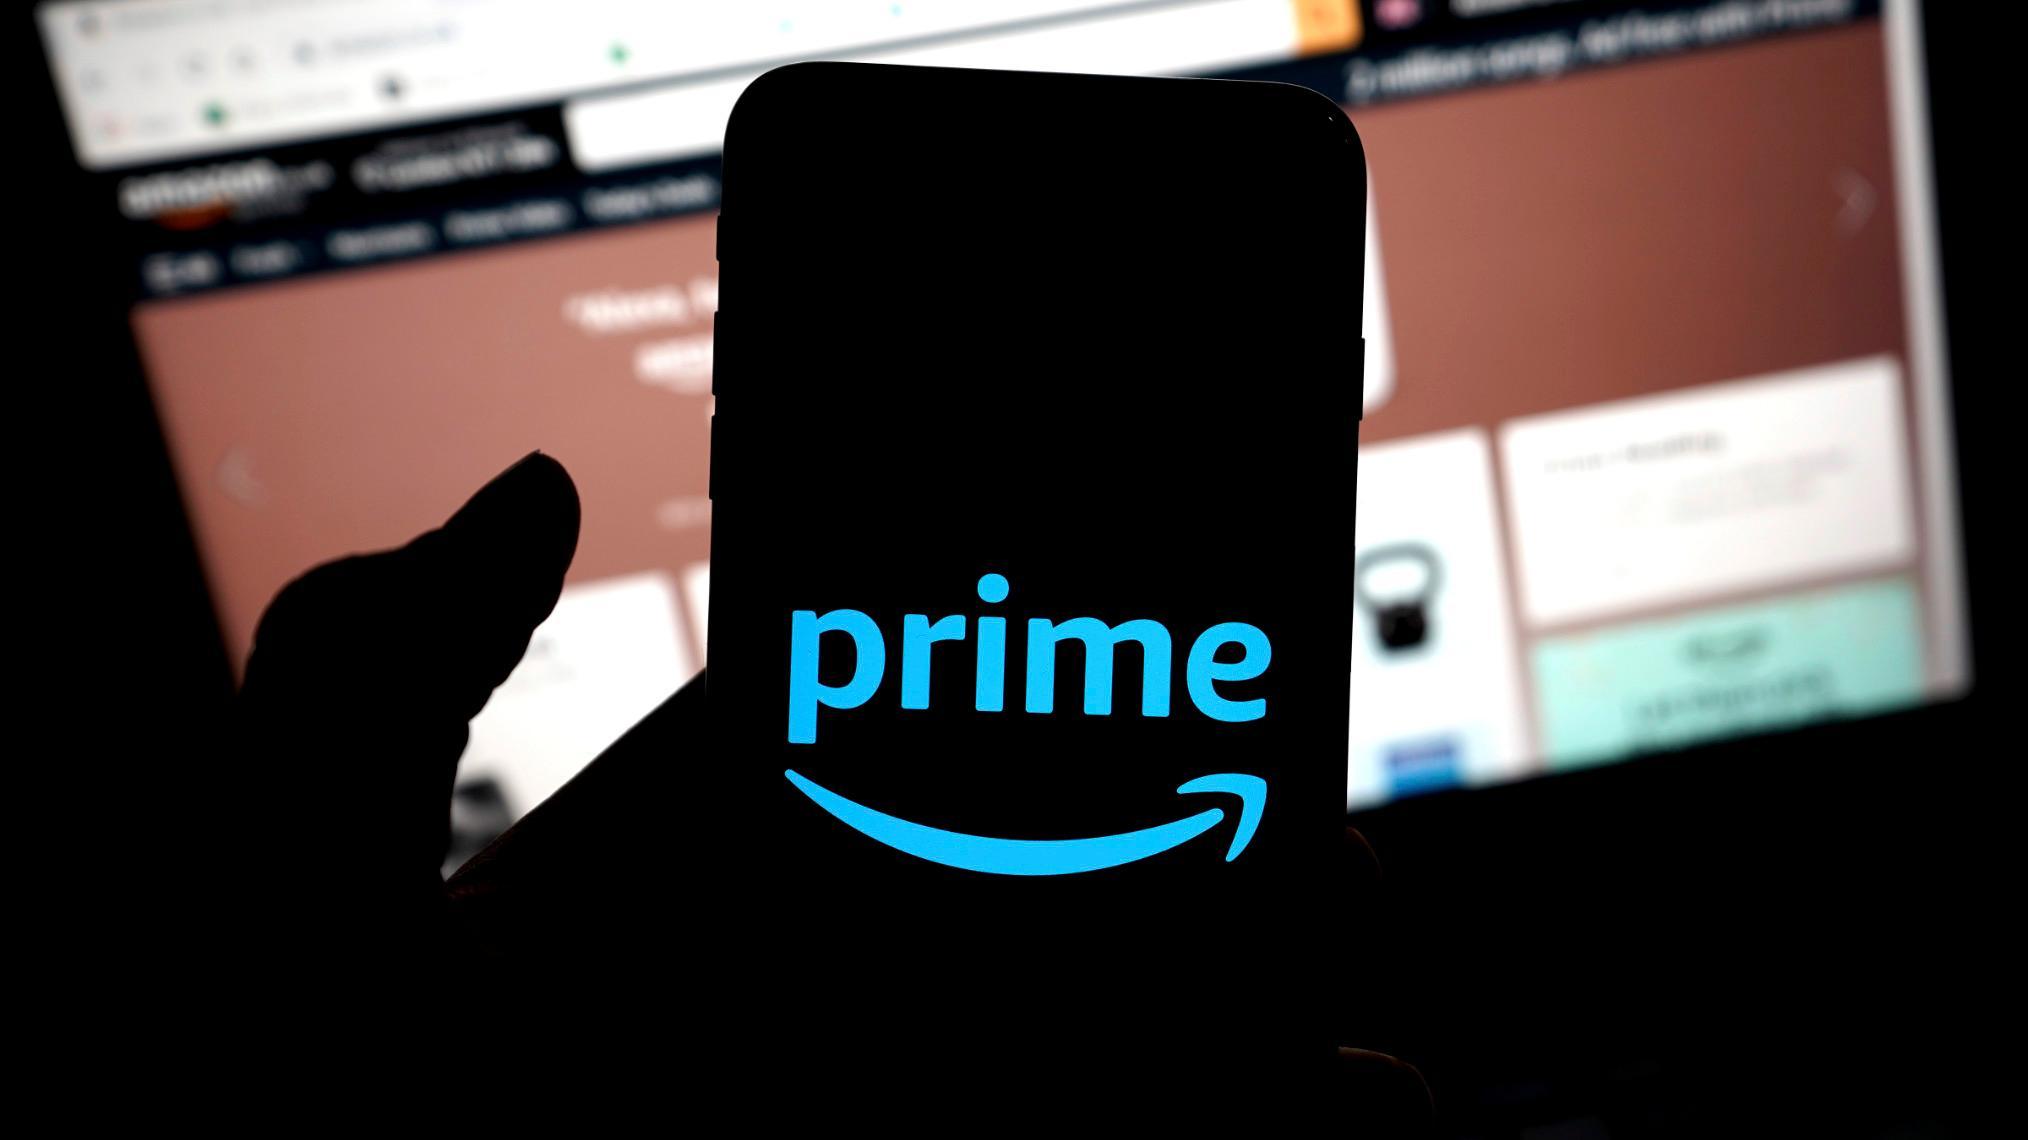 Amazon Prime logo on cell phone